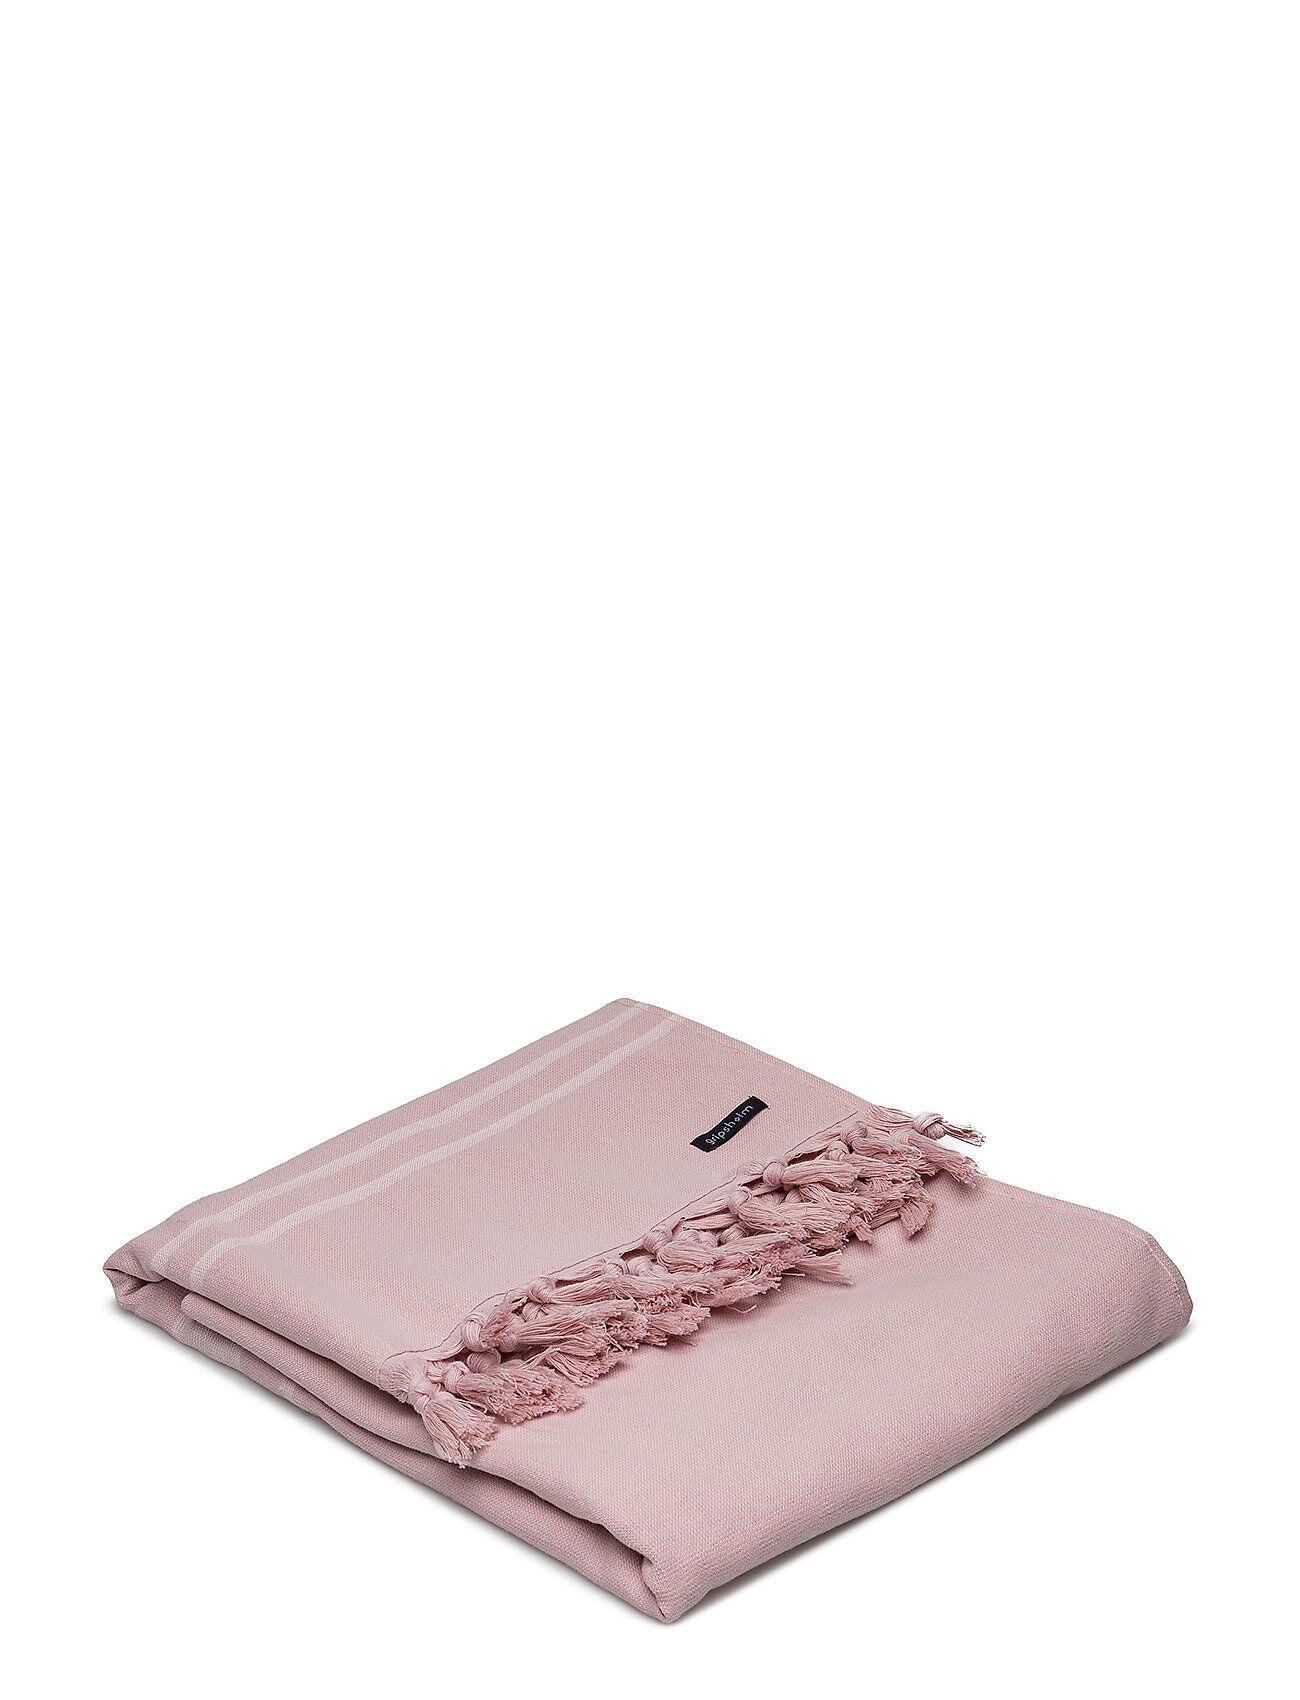 Gripsholm Towel Hamam